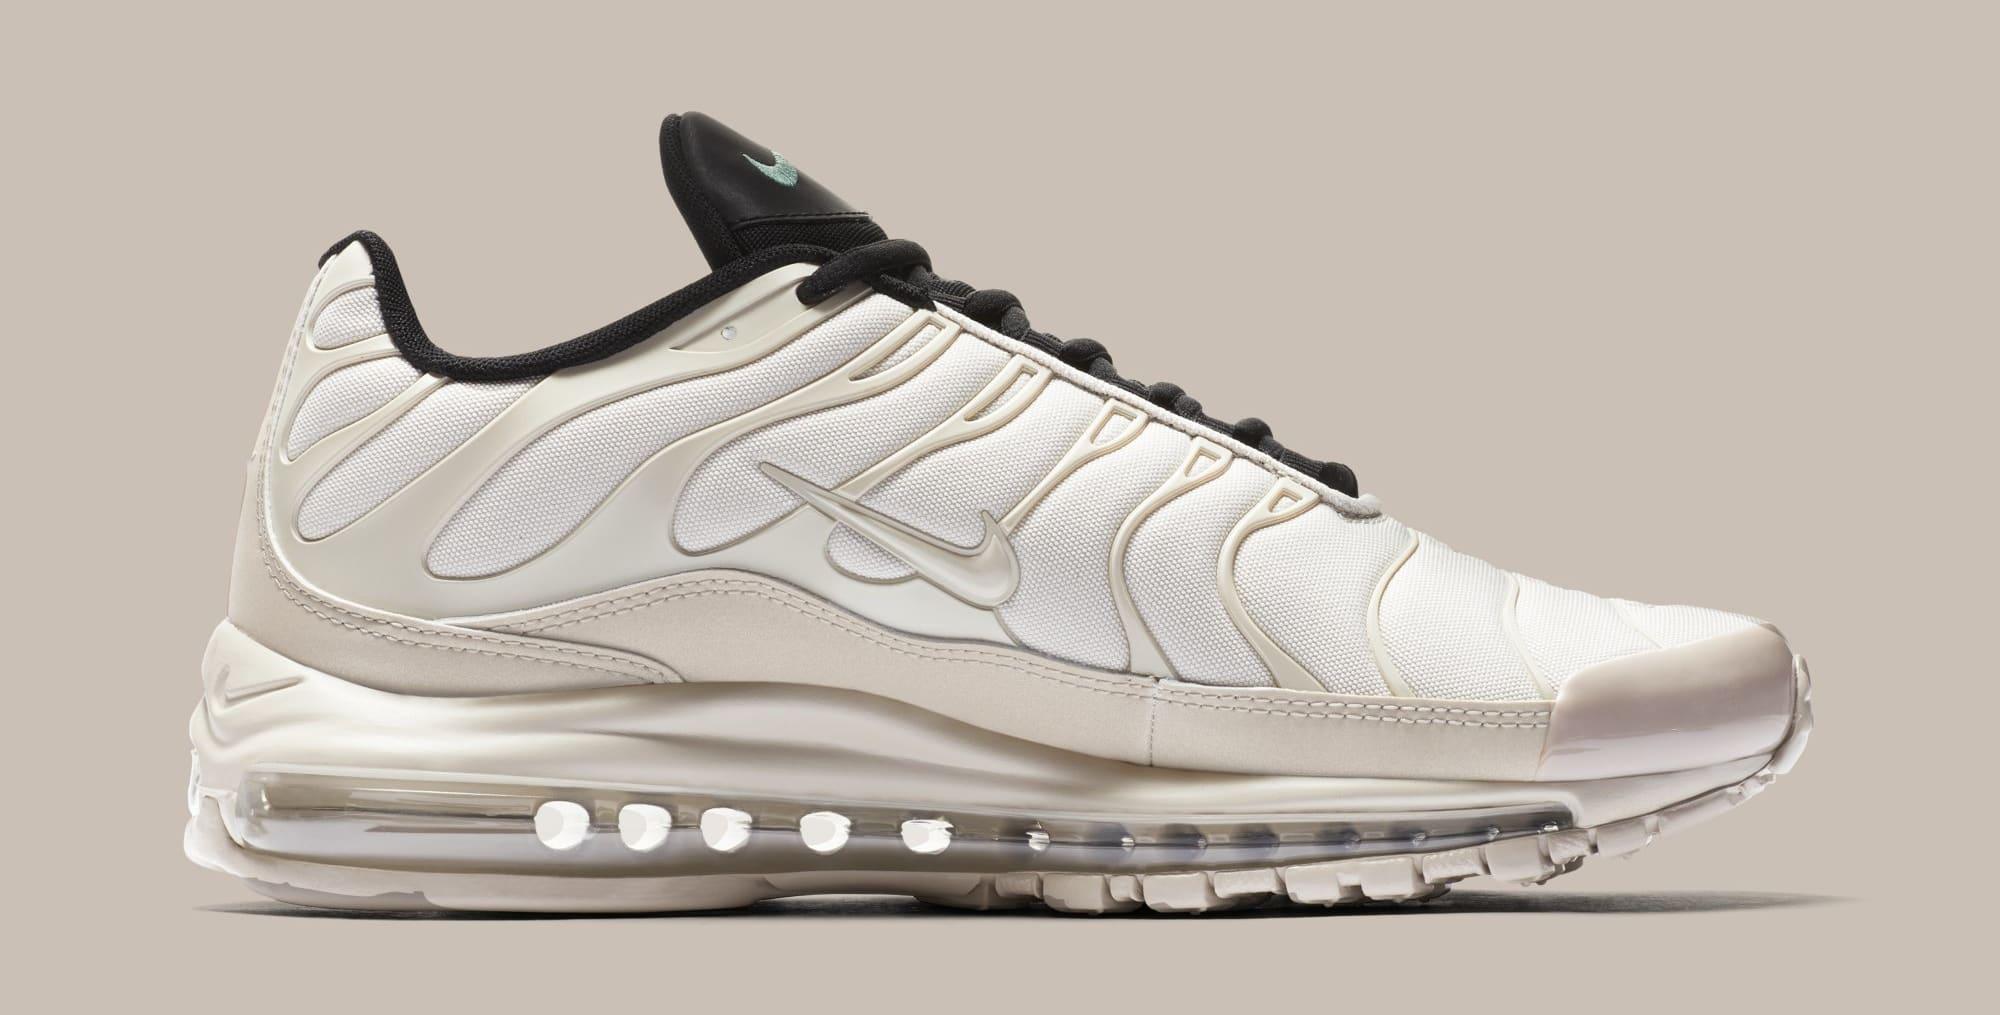 c93077d1328 Image via Nike Nike Air Max 97 Plus  Light Orewood Brown  AH8144-101 (Medial